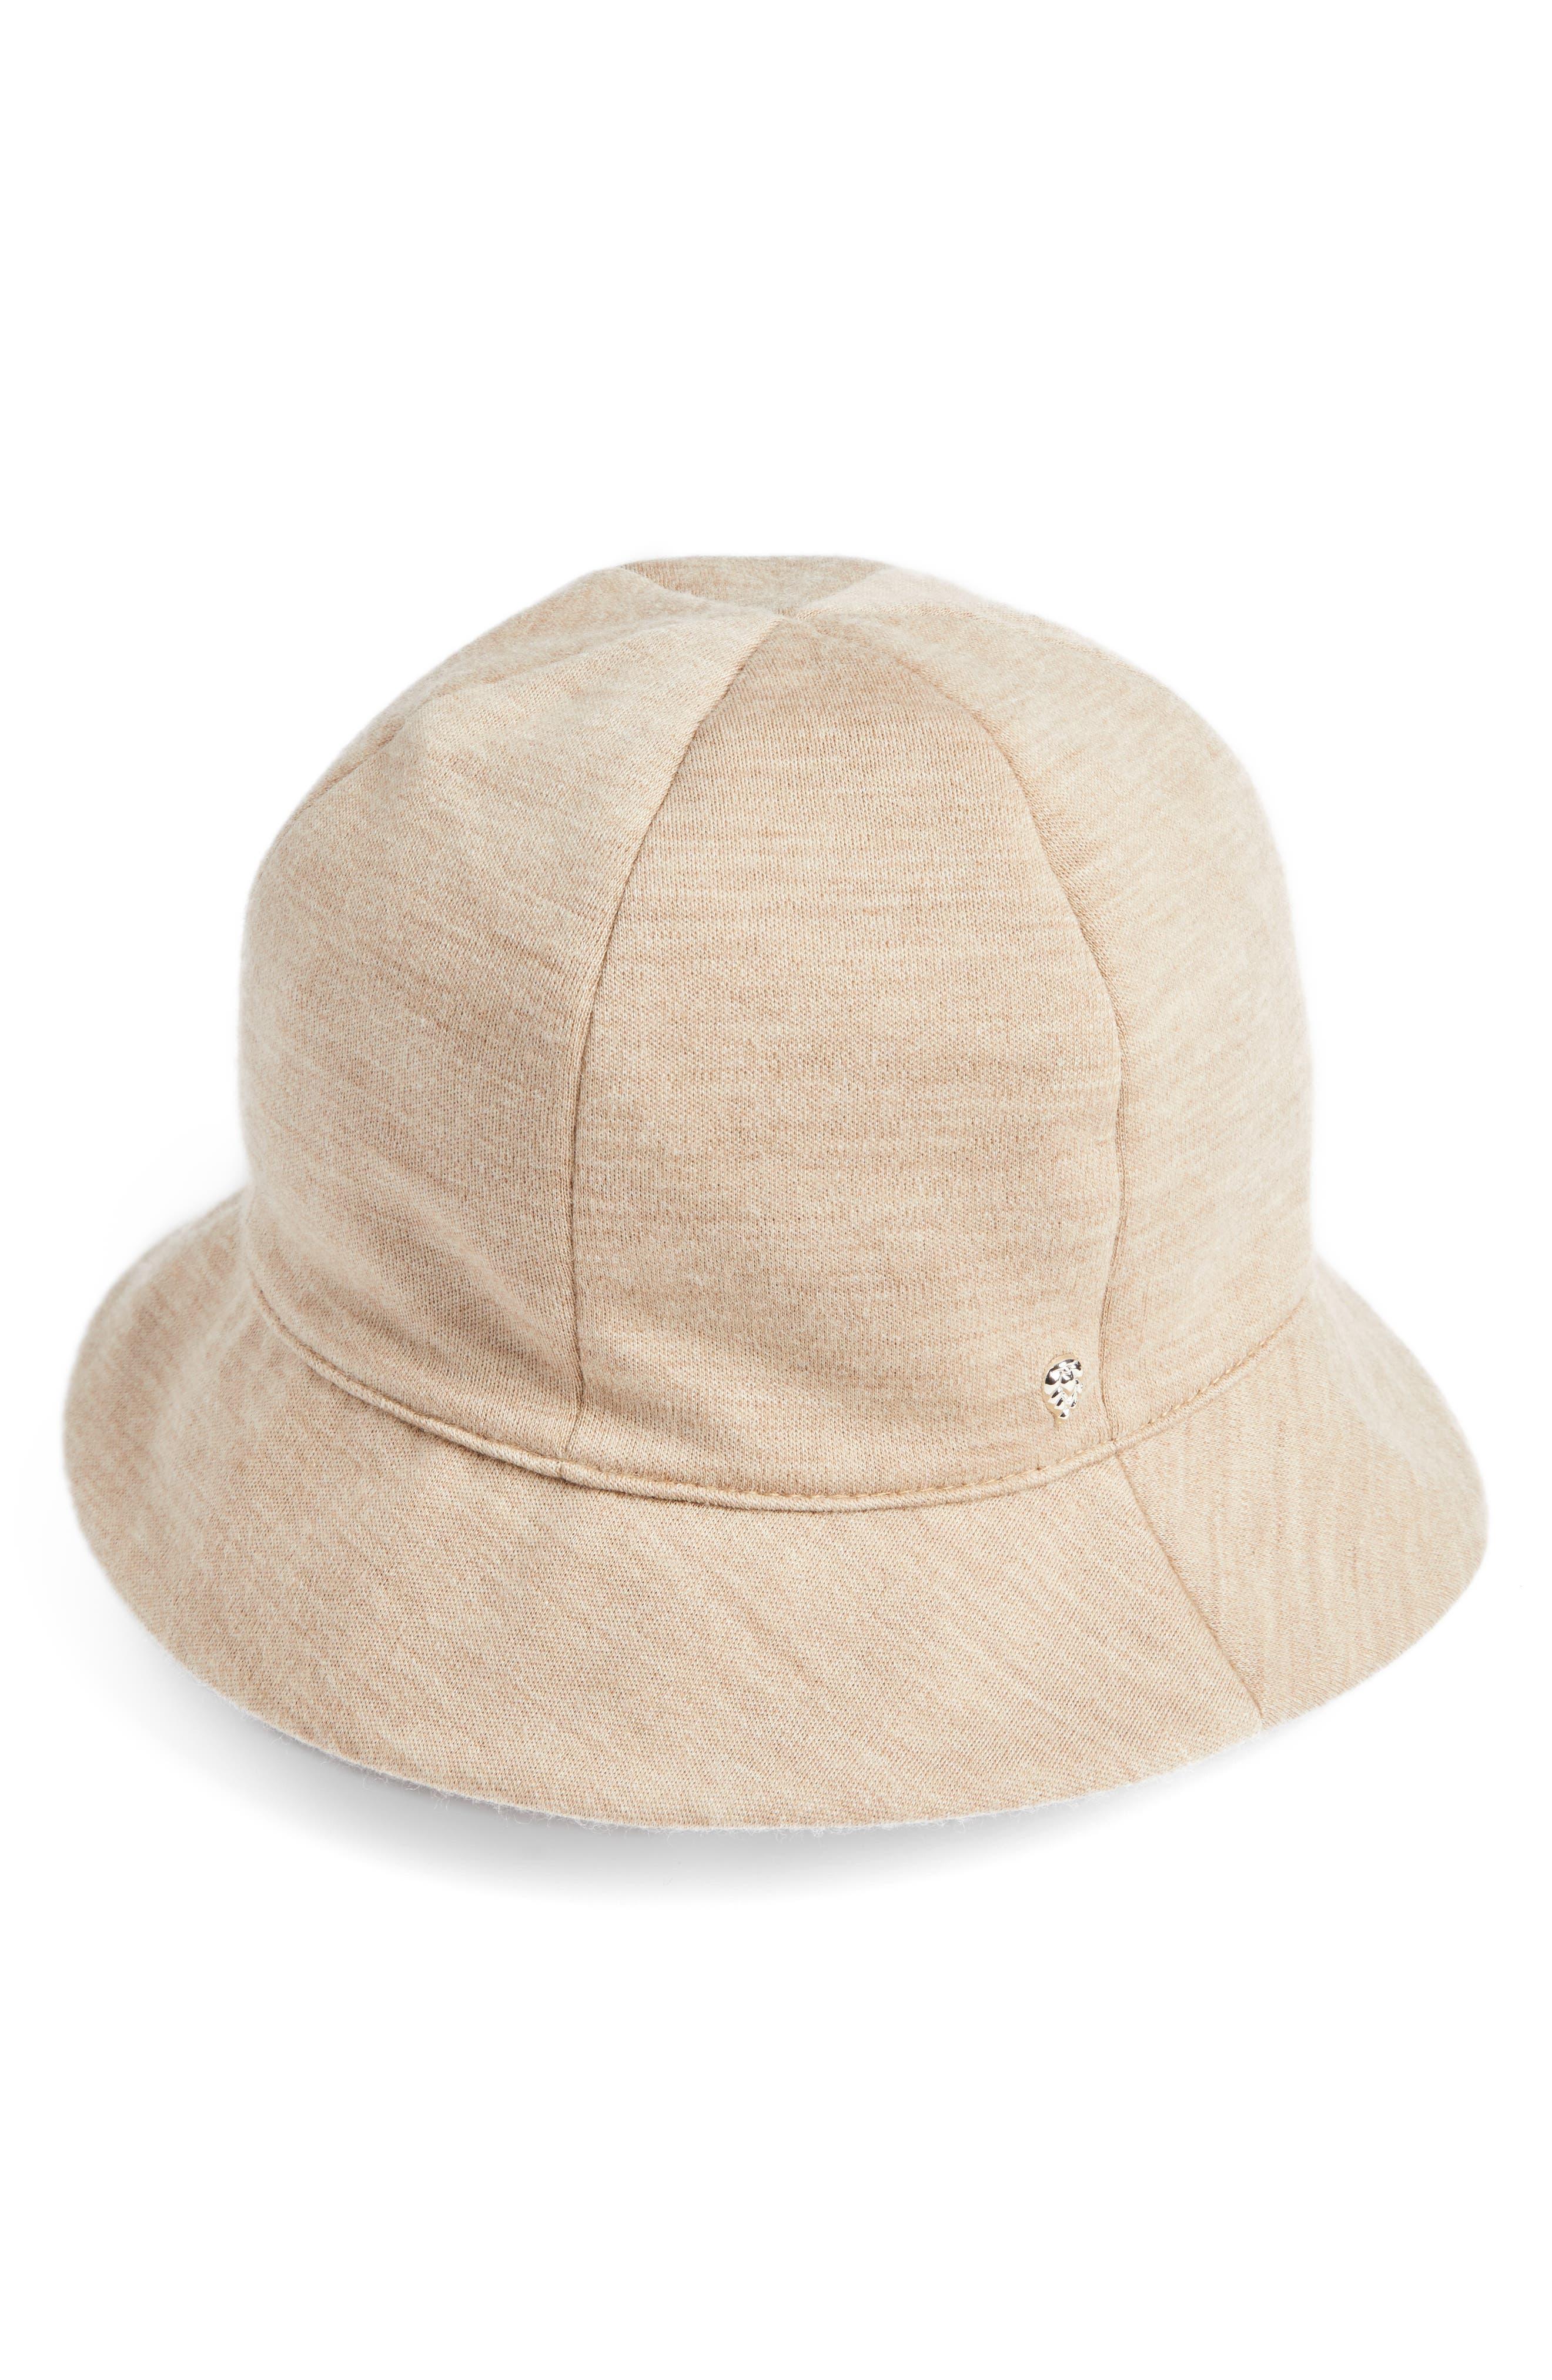 Merino Wool Jersey Bucket Hat,                             Main thumbnail 1, color,                             Camel Melange